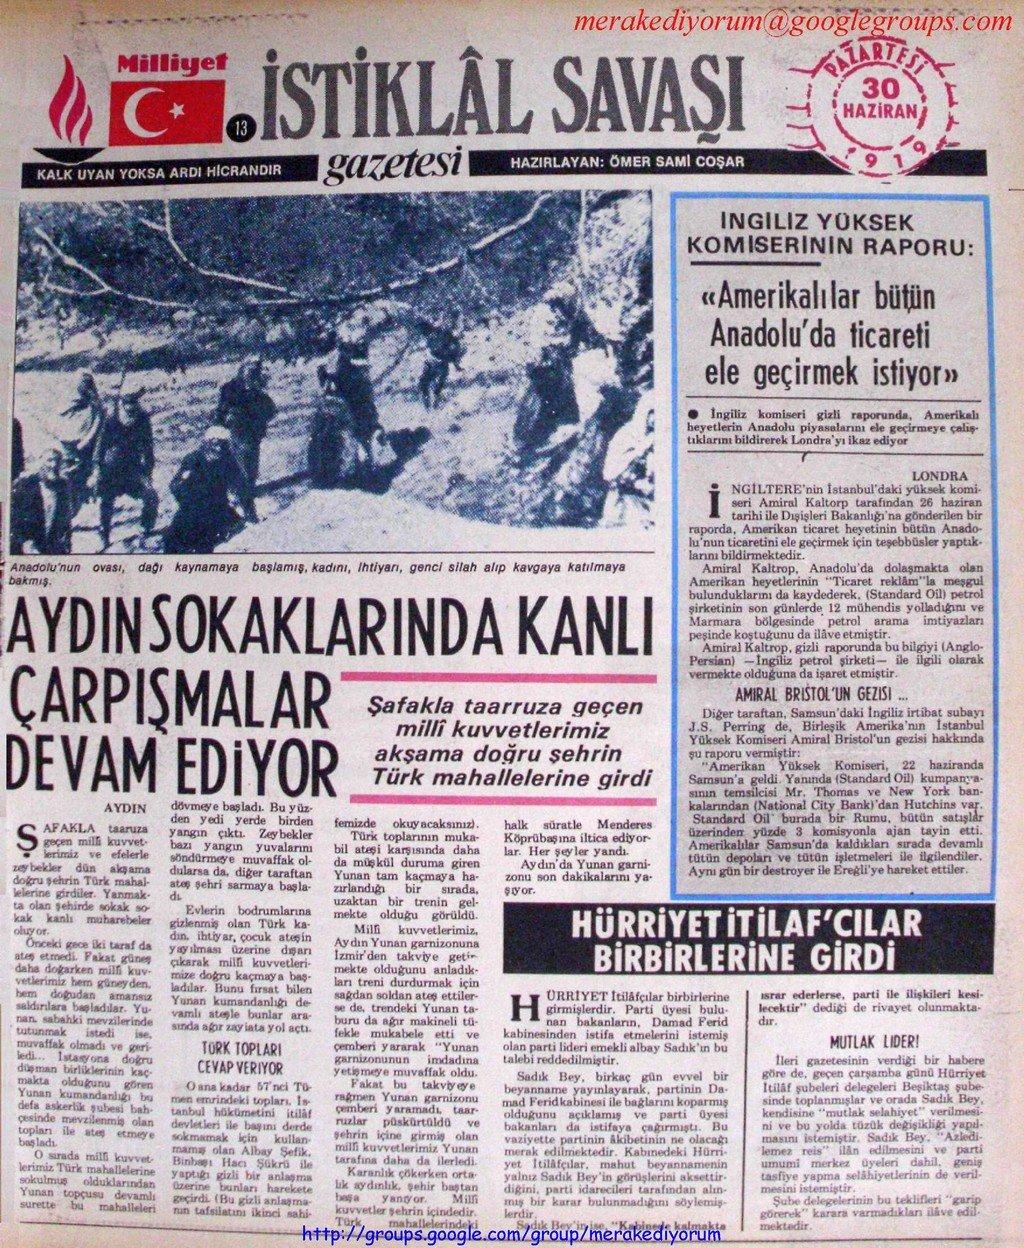 istiklal savaşı gazetesi - 30 haziran 1919